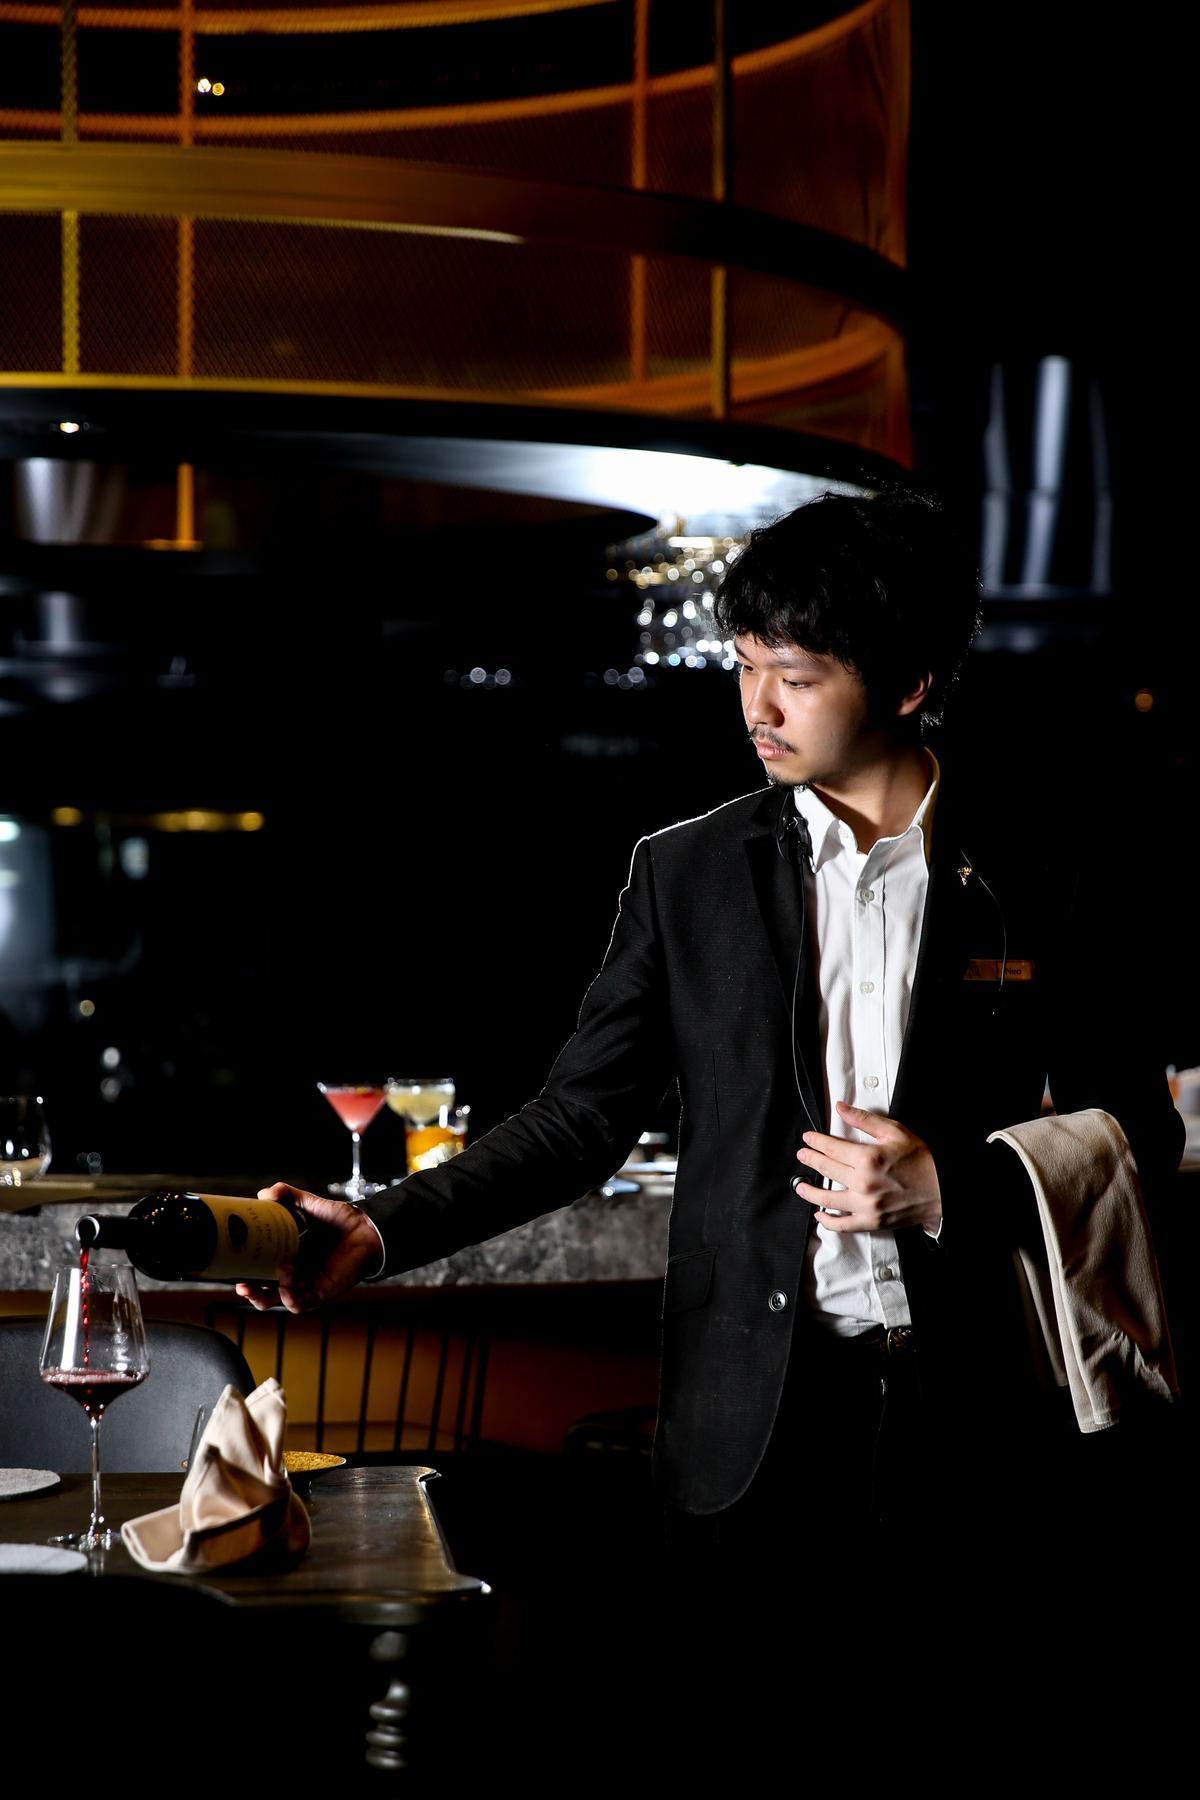 「Orchid Restaurant 蘭」有專業侍酒師可建議葡萄酒搭餐。